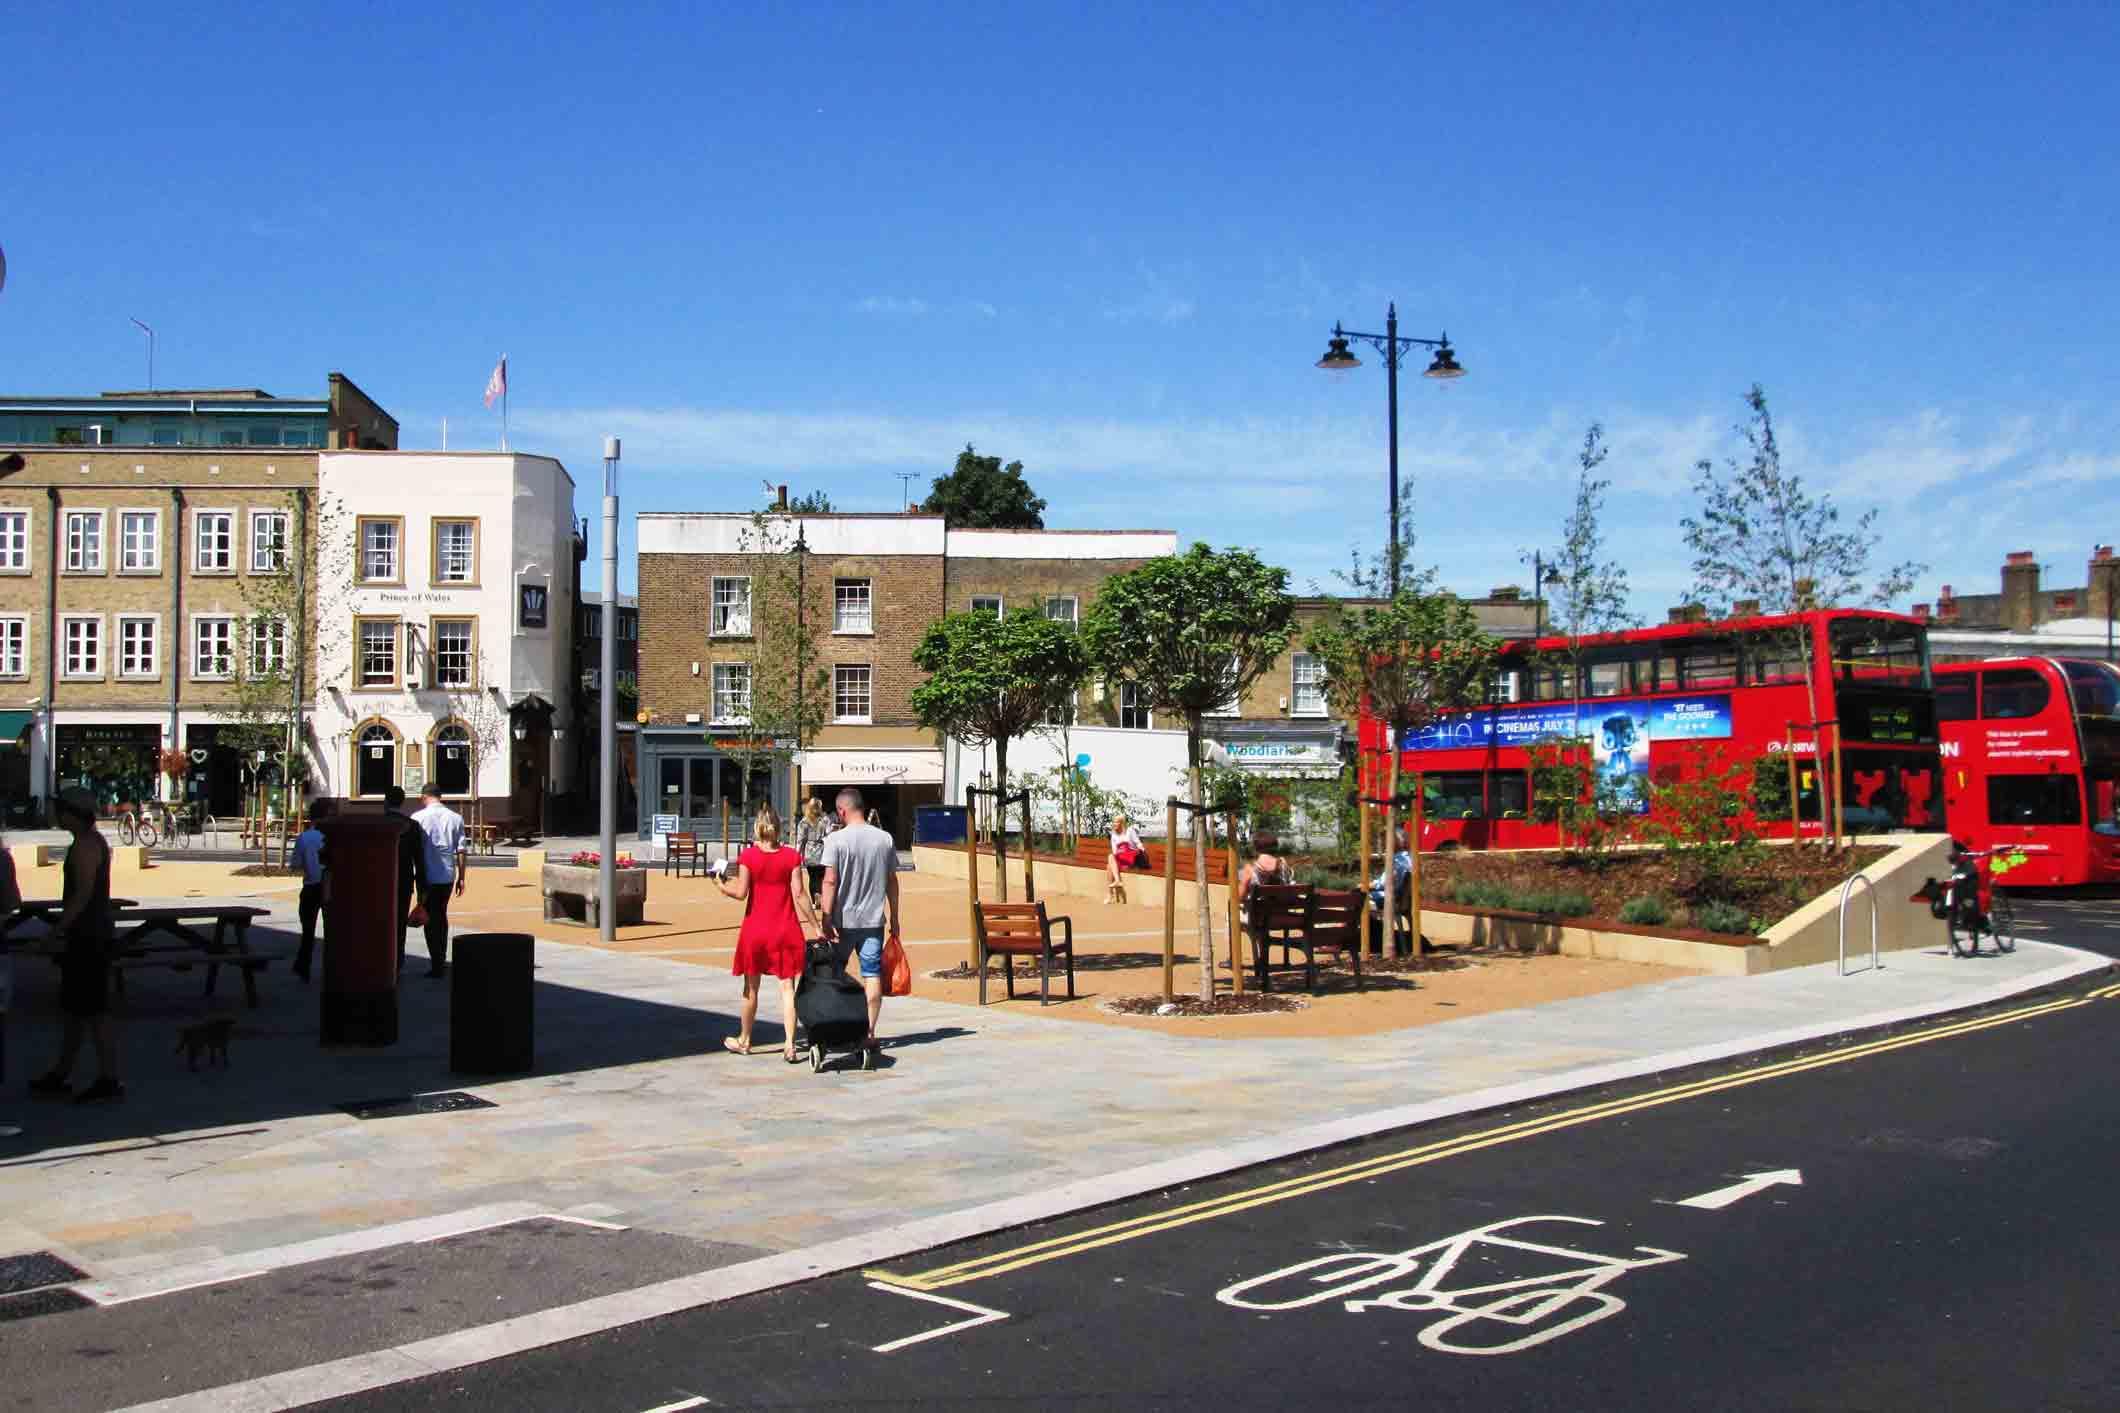 Clapham-Old-Town-Regeneration-Project-3 website